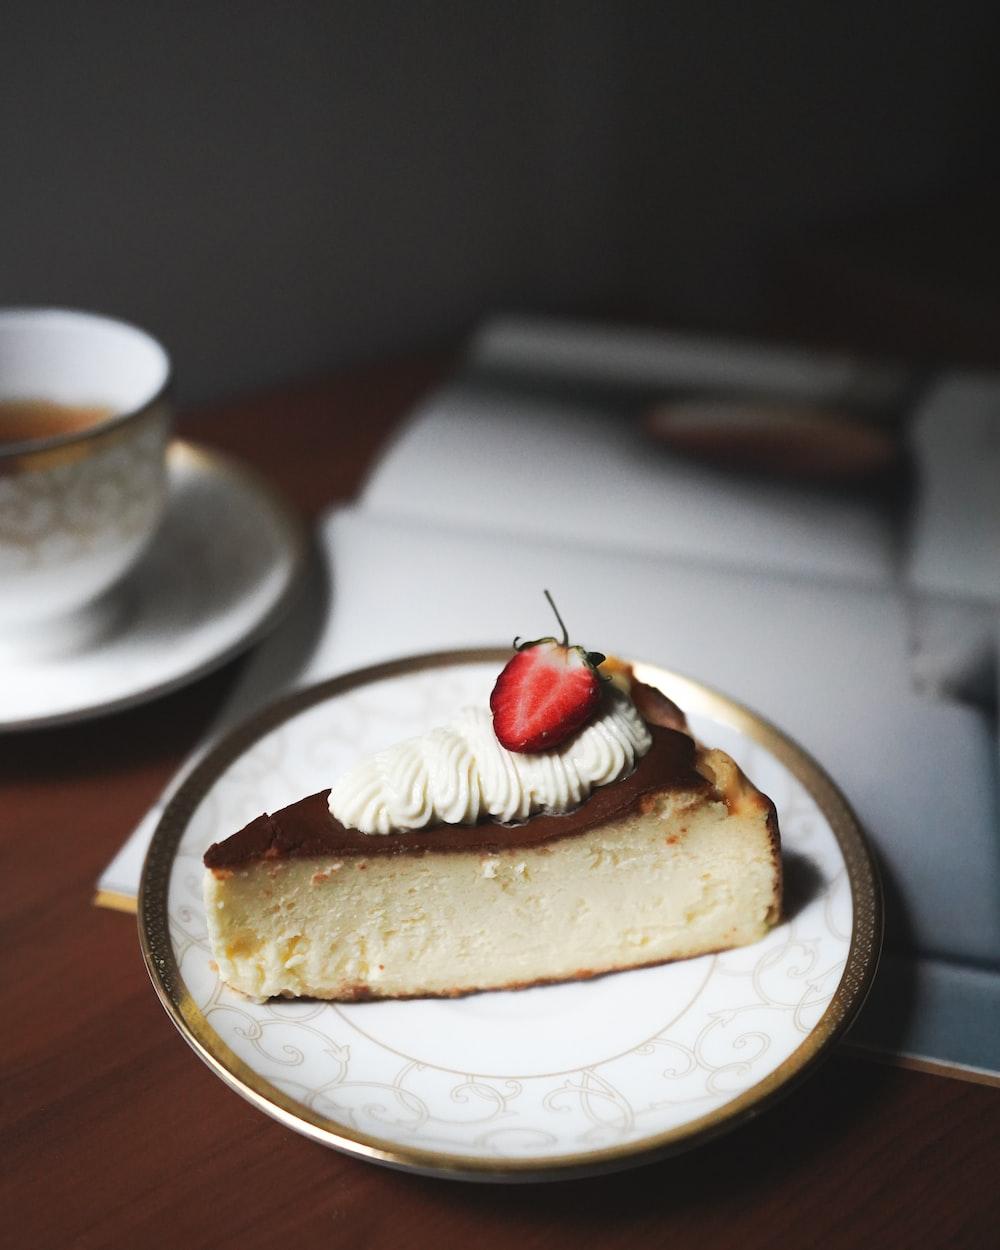 brown cake on white ceramic plate